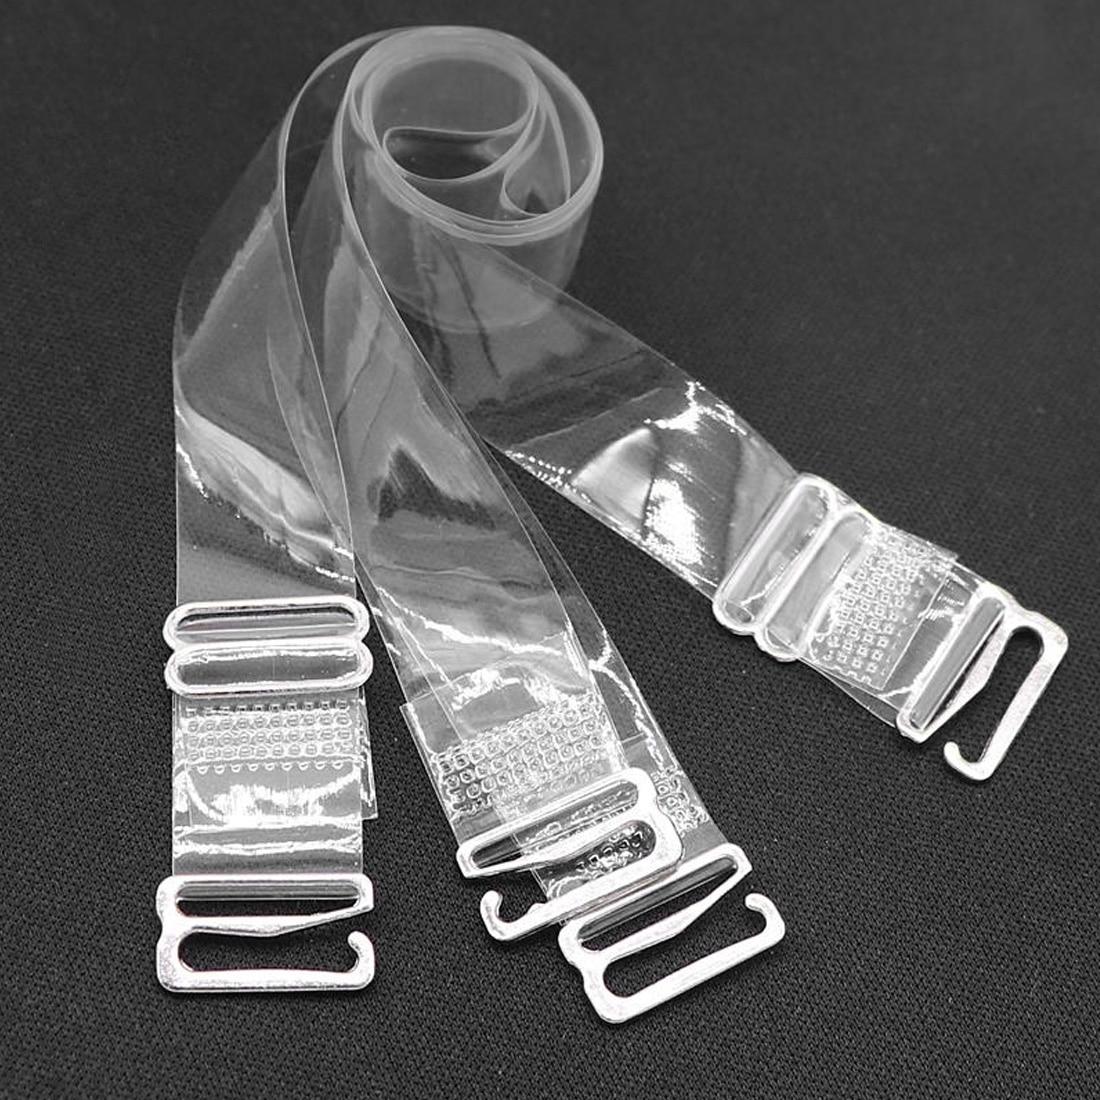 Elastic Buckle Bra Belt Womens Transparent Silicone Straps Adjustable Intimates Accessories